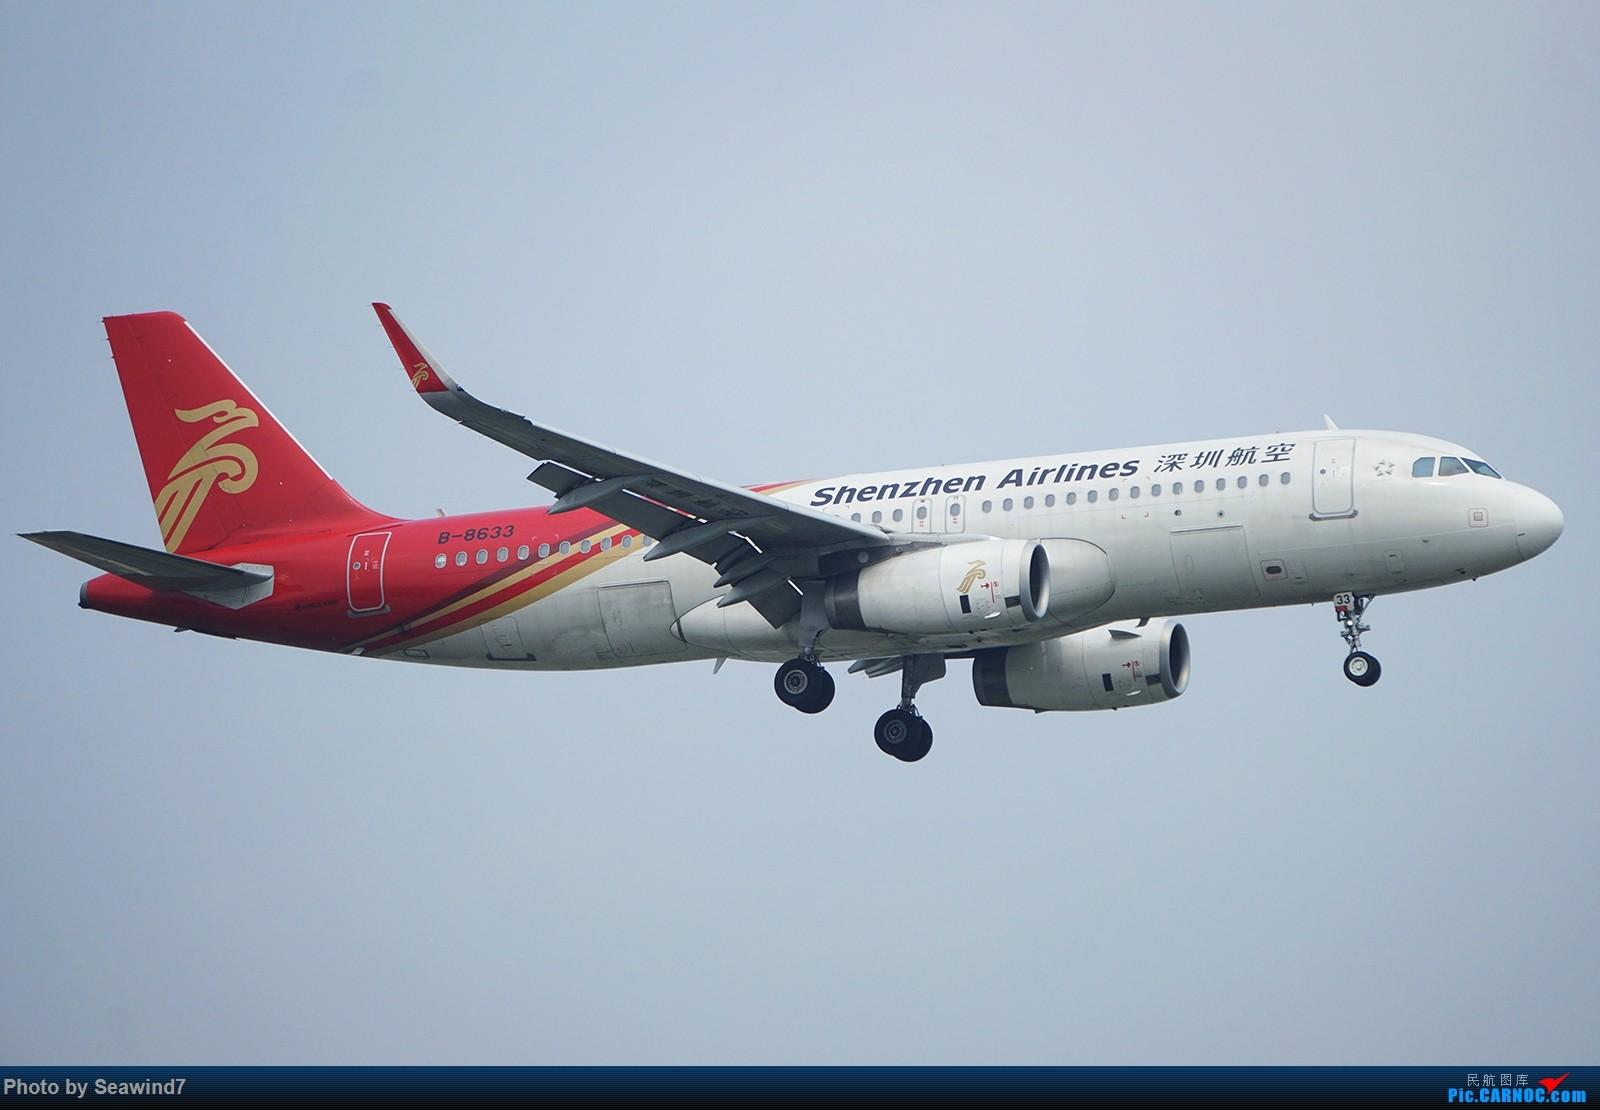 Re:[原创]新手的五一假期(含玩具总动员) AIRBUS A320-200 B-8633 中国上海虹桥国际机场